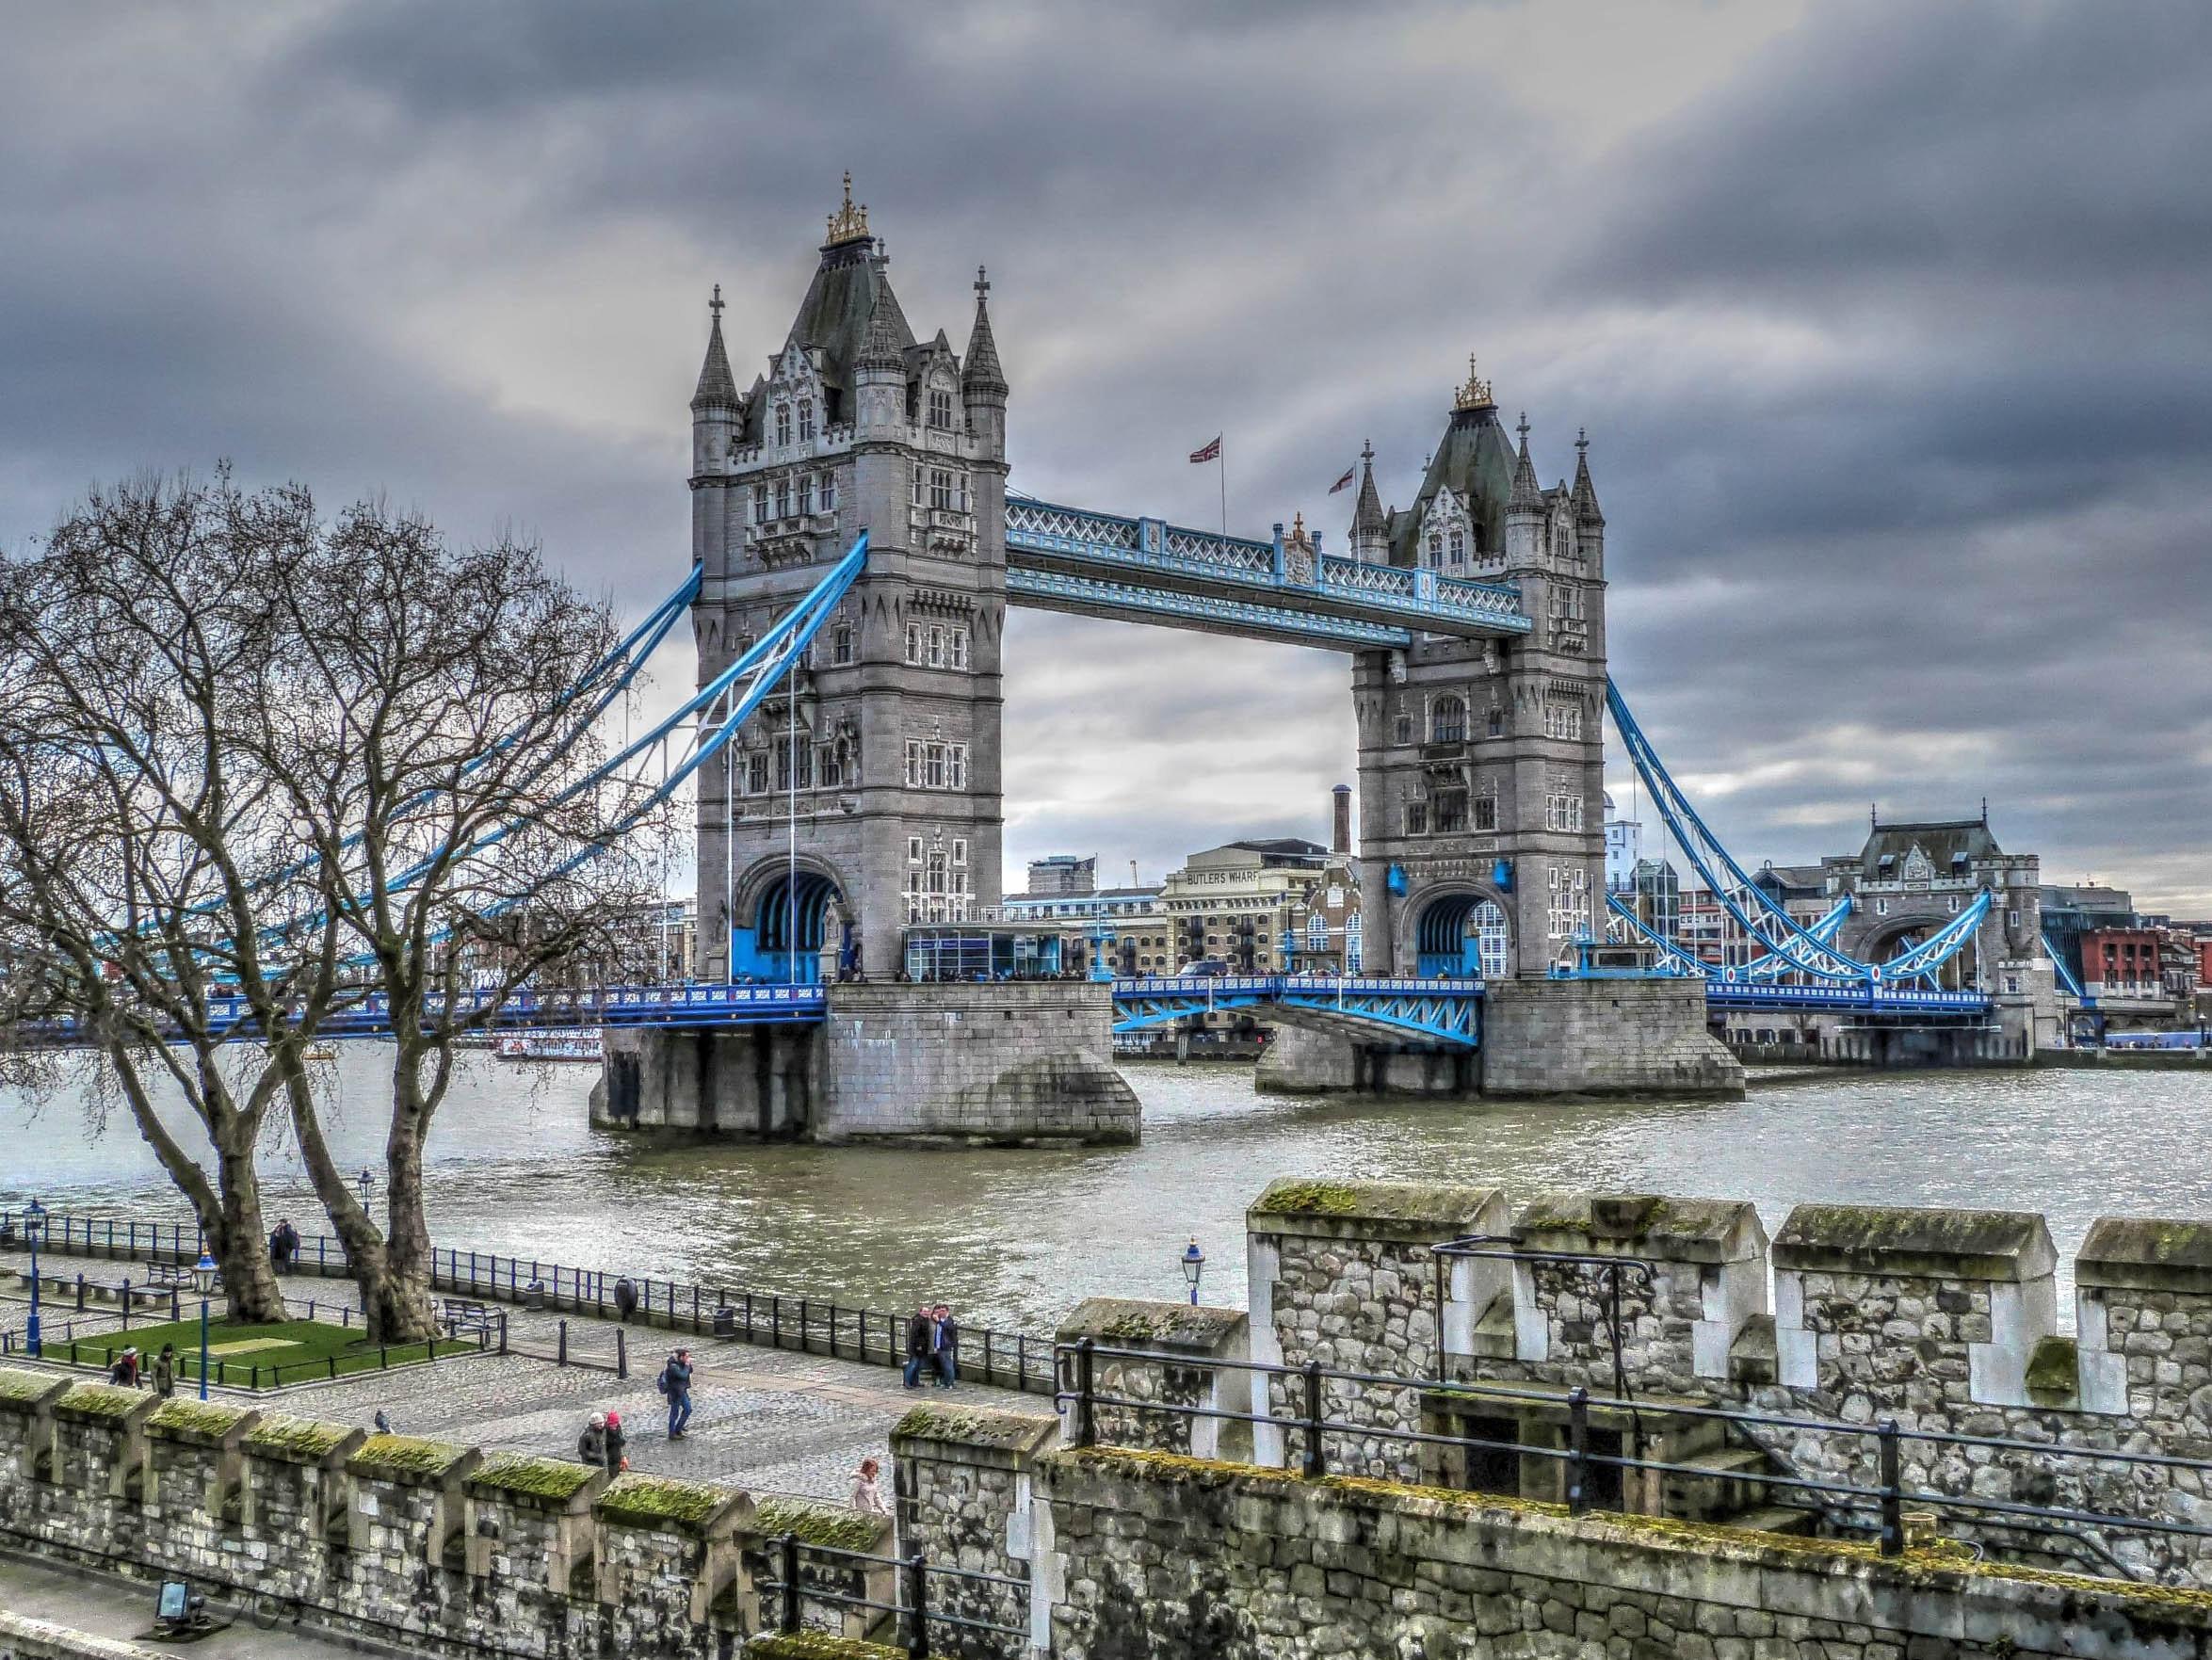 Tower Bridge, Ancient, Waterfront, Water, Urban, HQ Photo